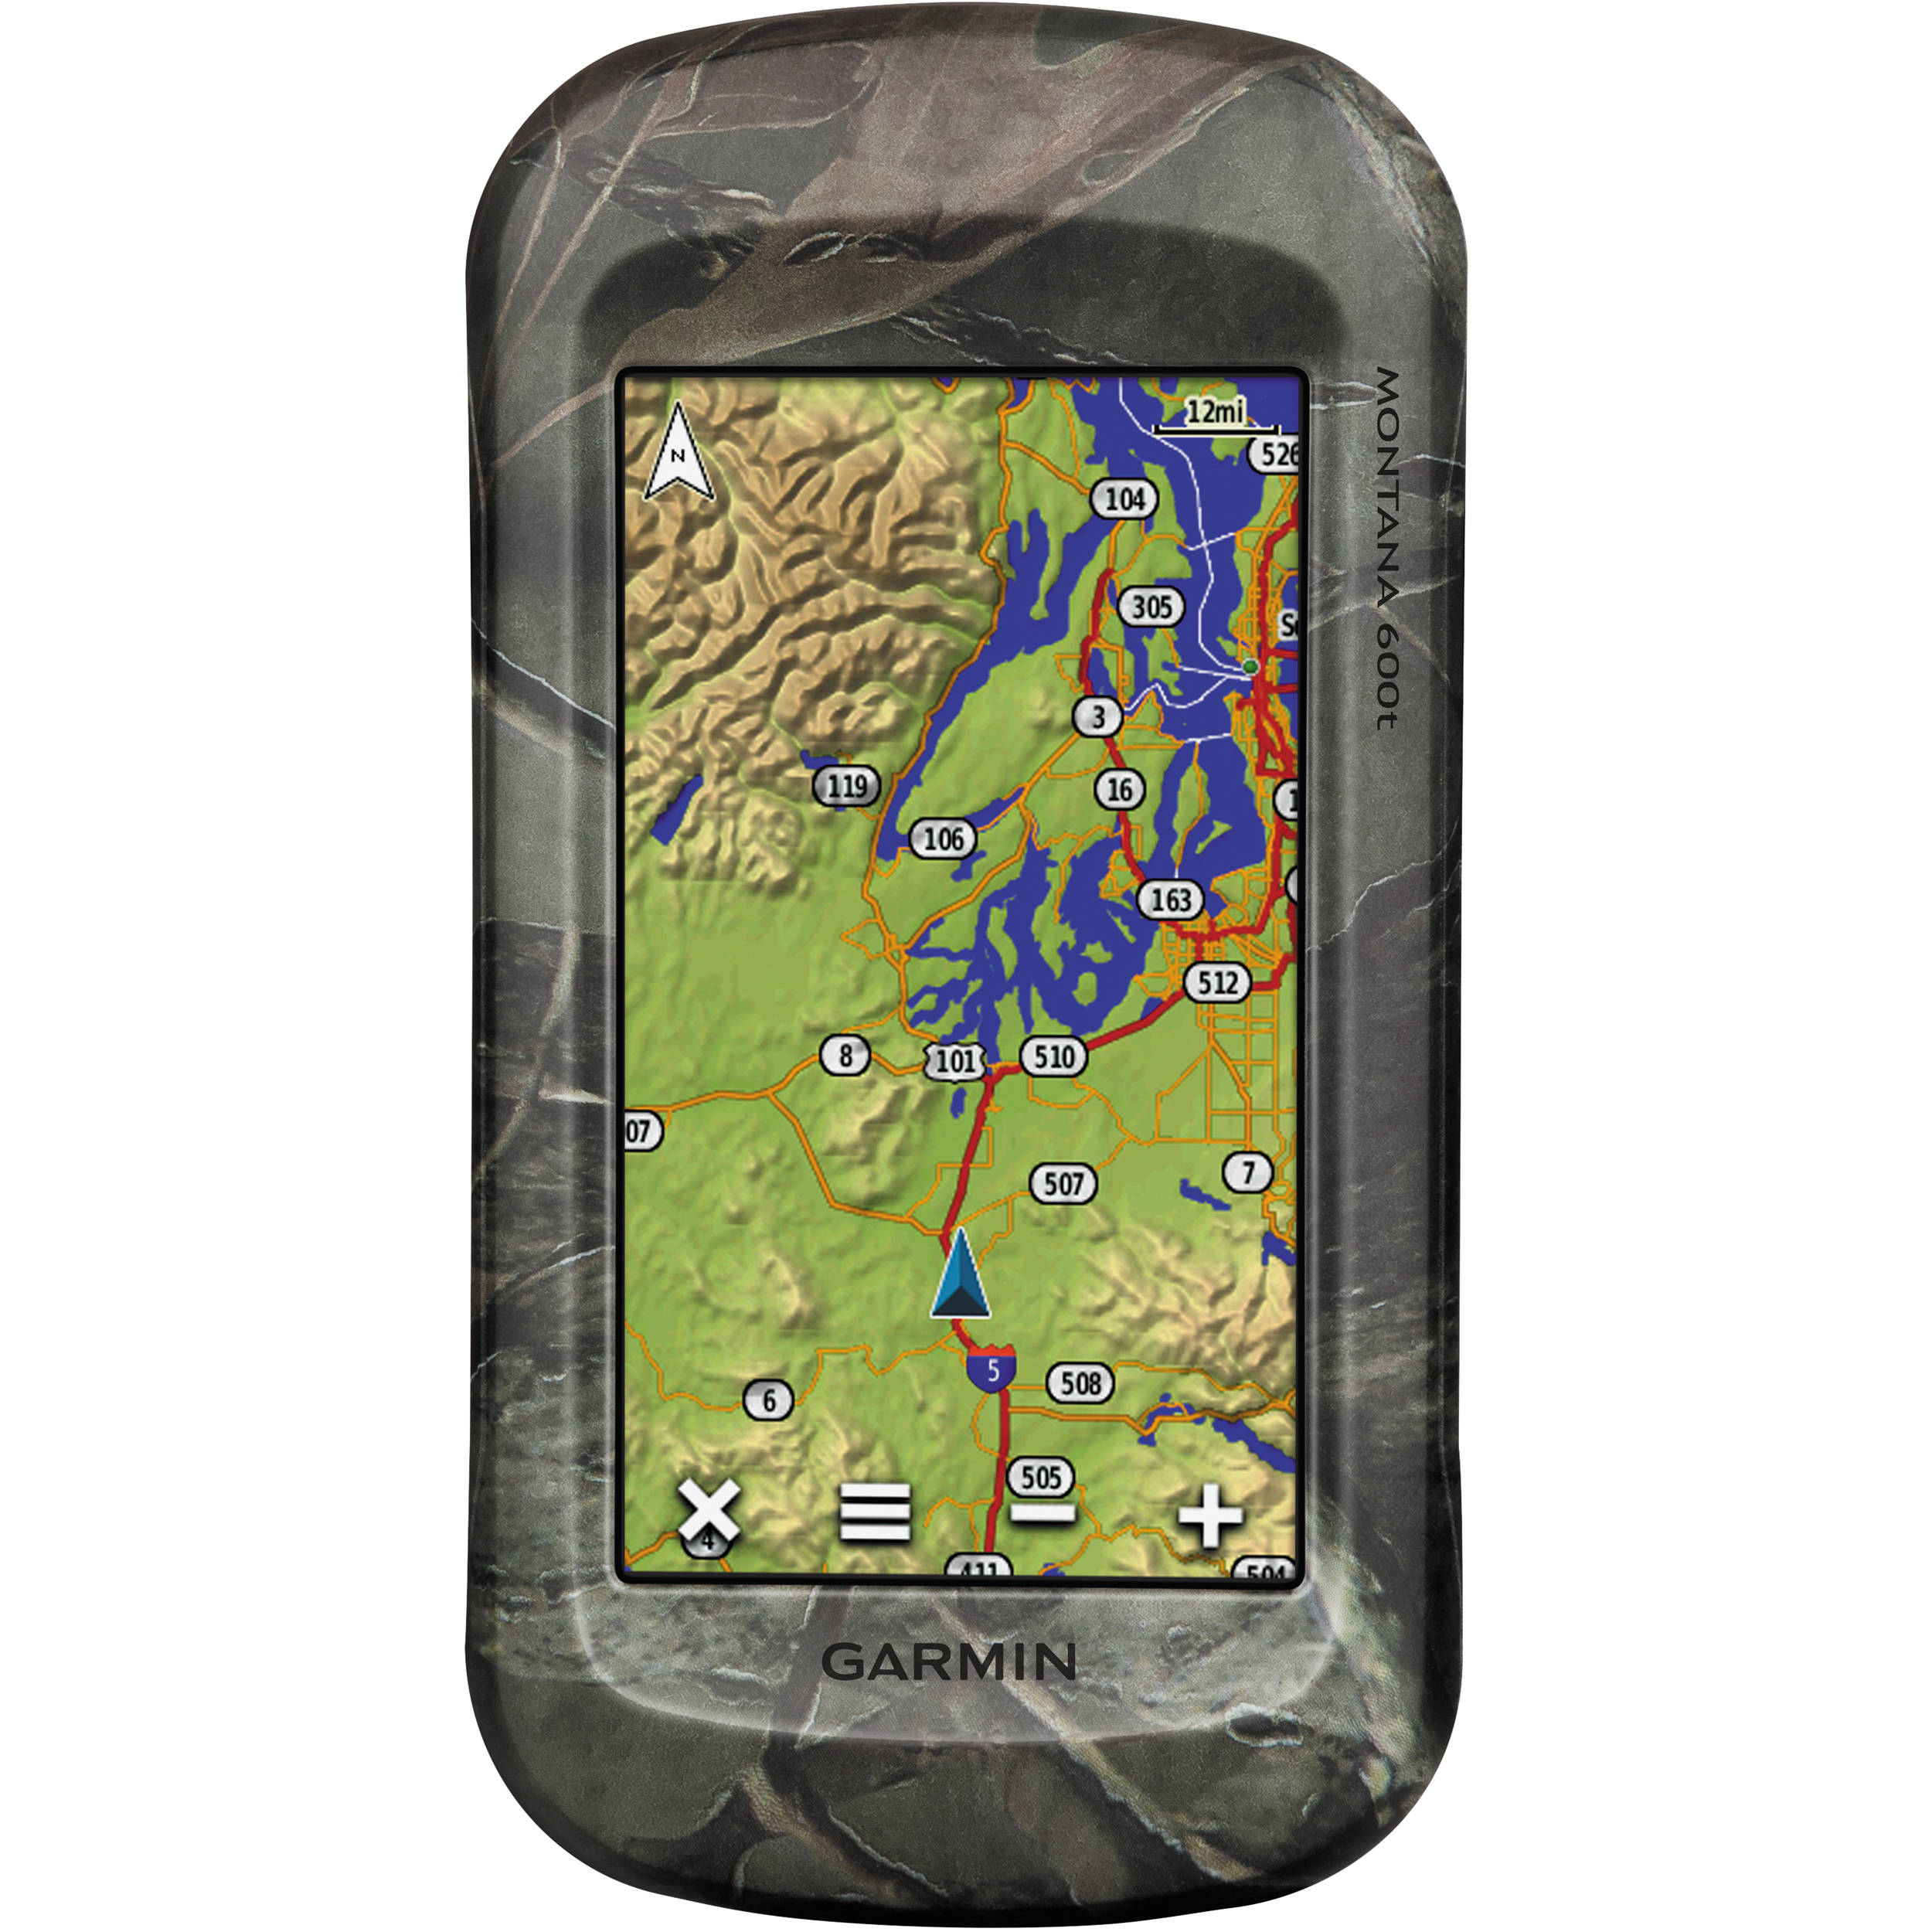 Garmin Montana 600t Outdoor GPS with TOPO U S  100K maps (Camo)